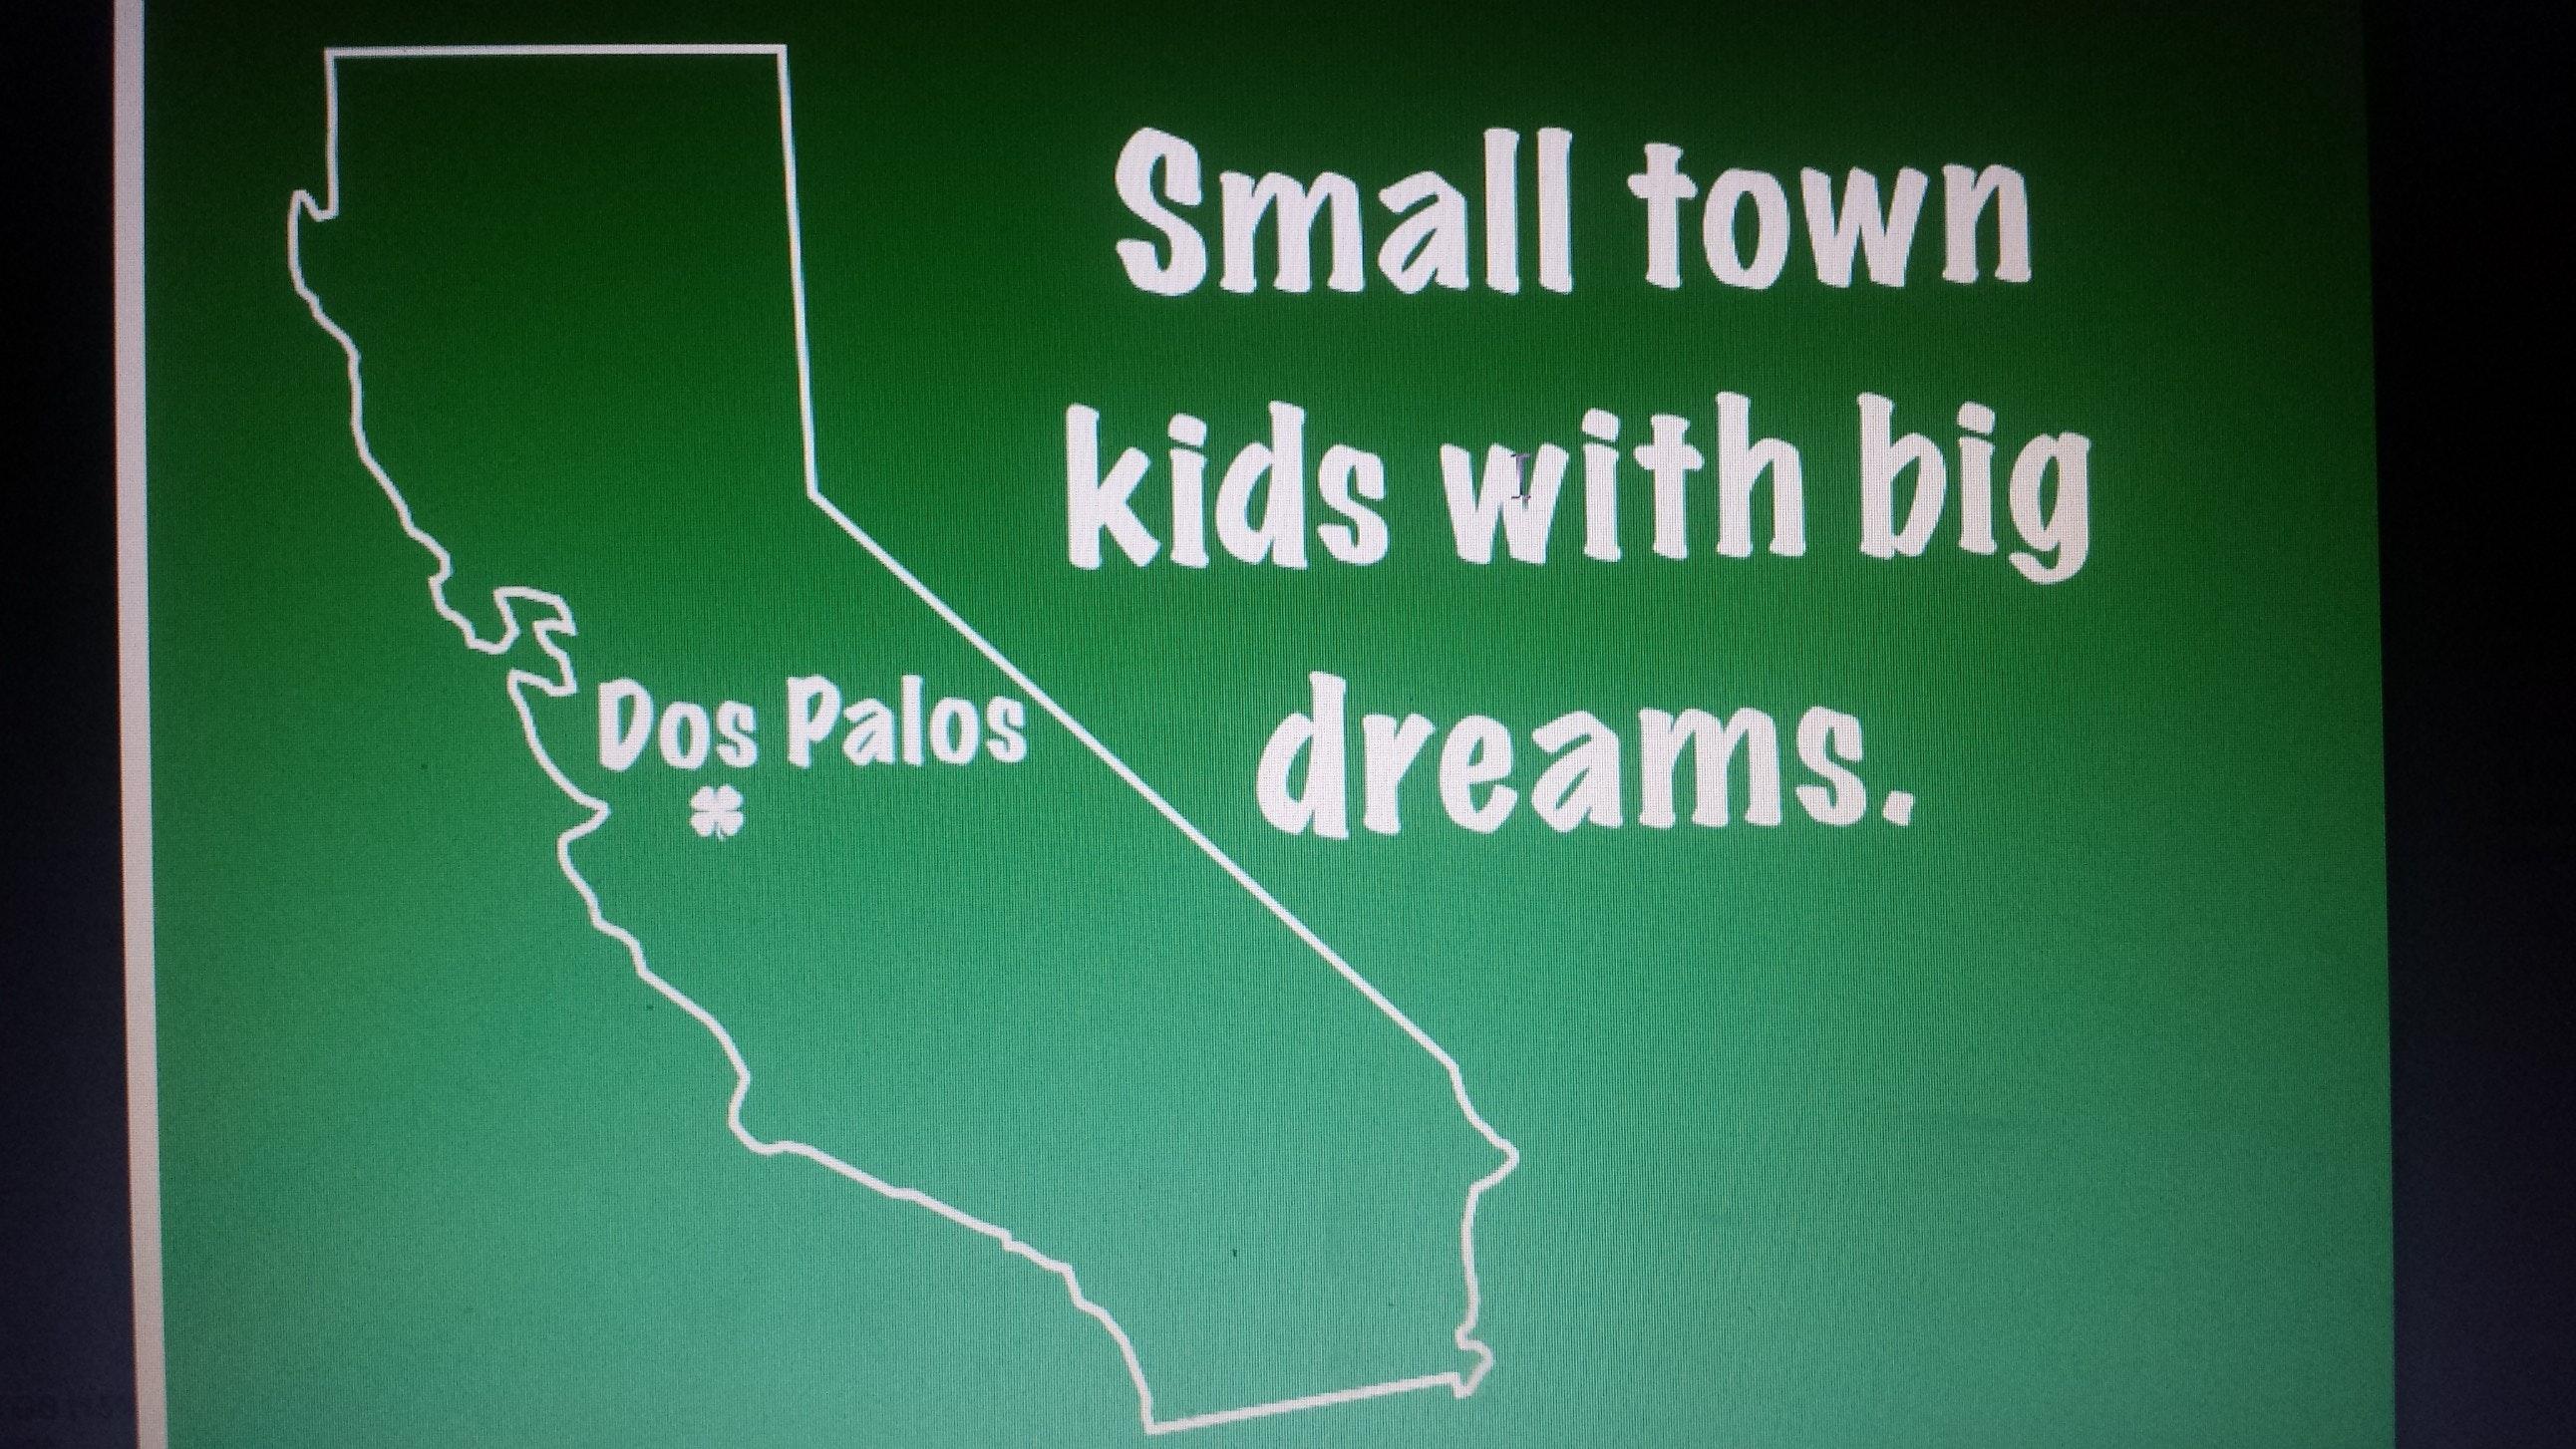 Dos Palos Community 4-H